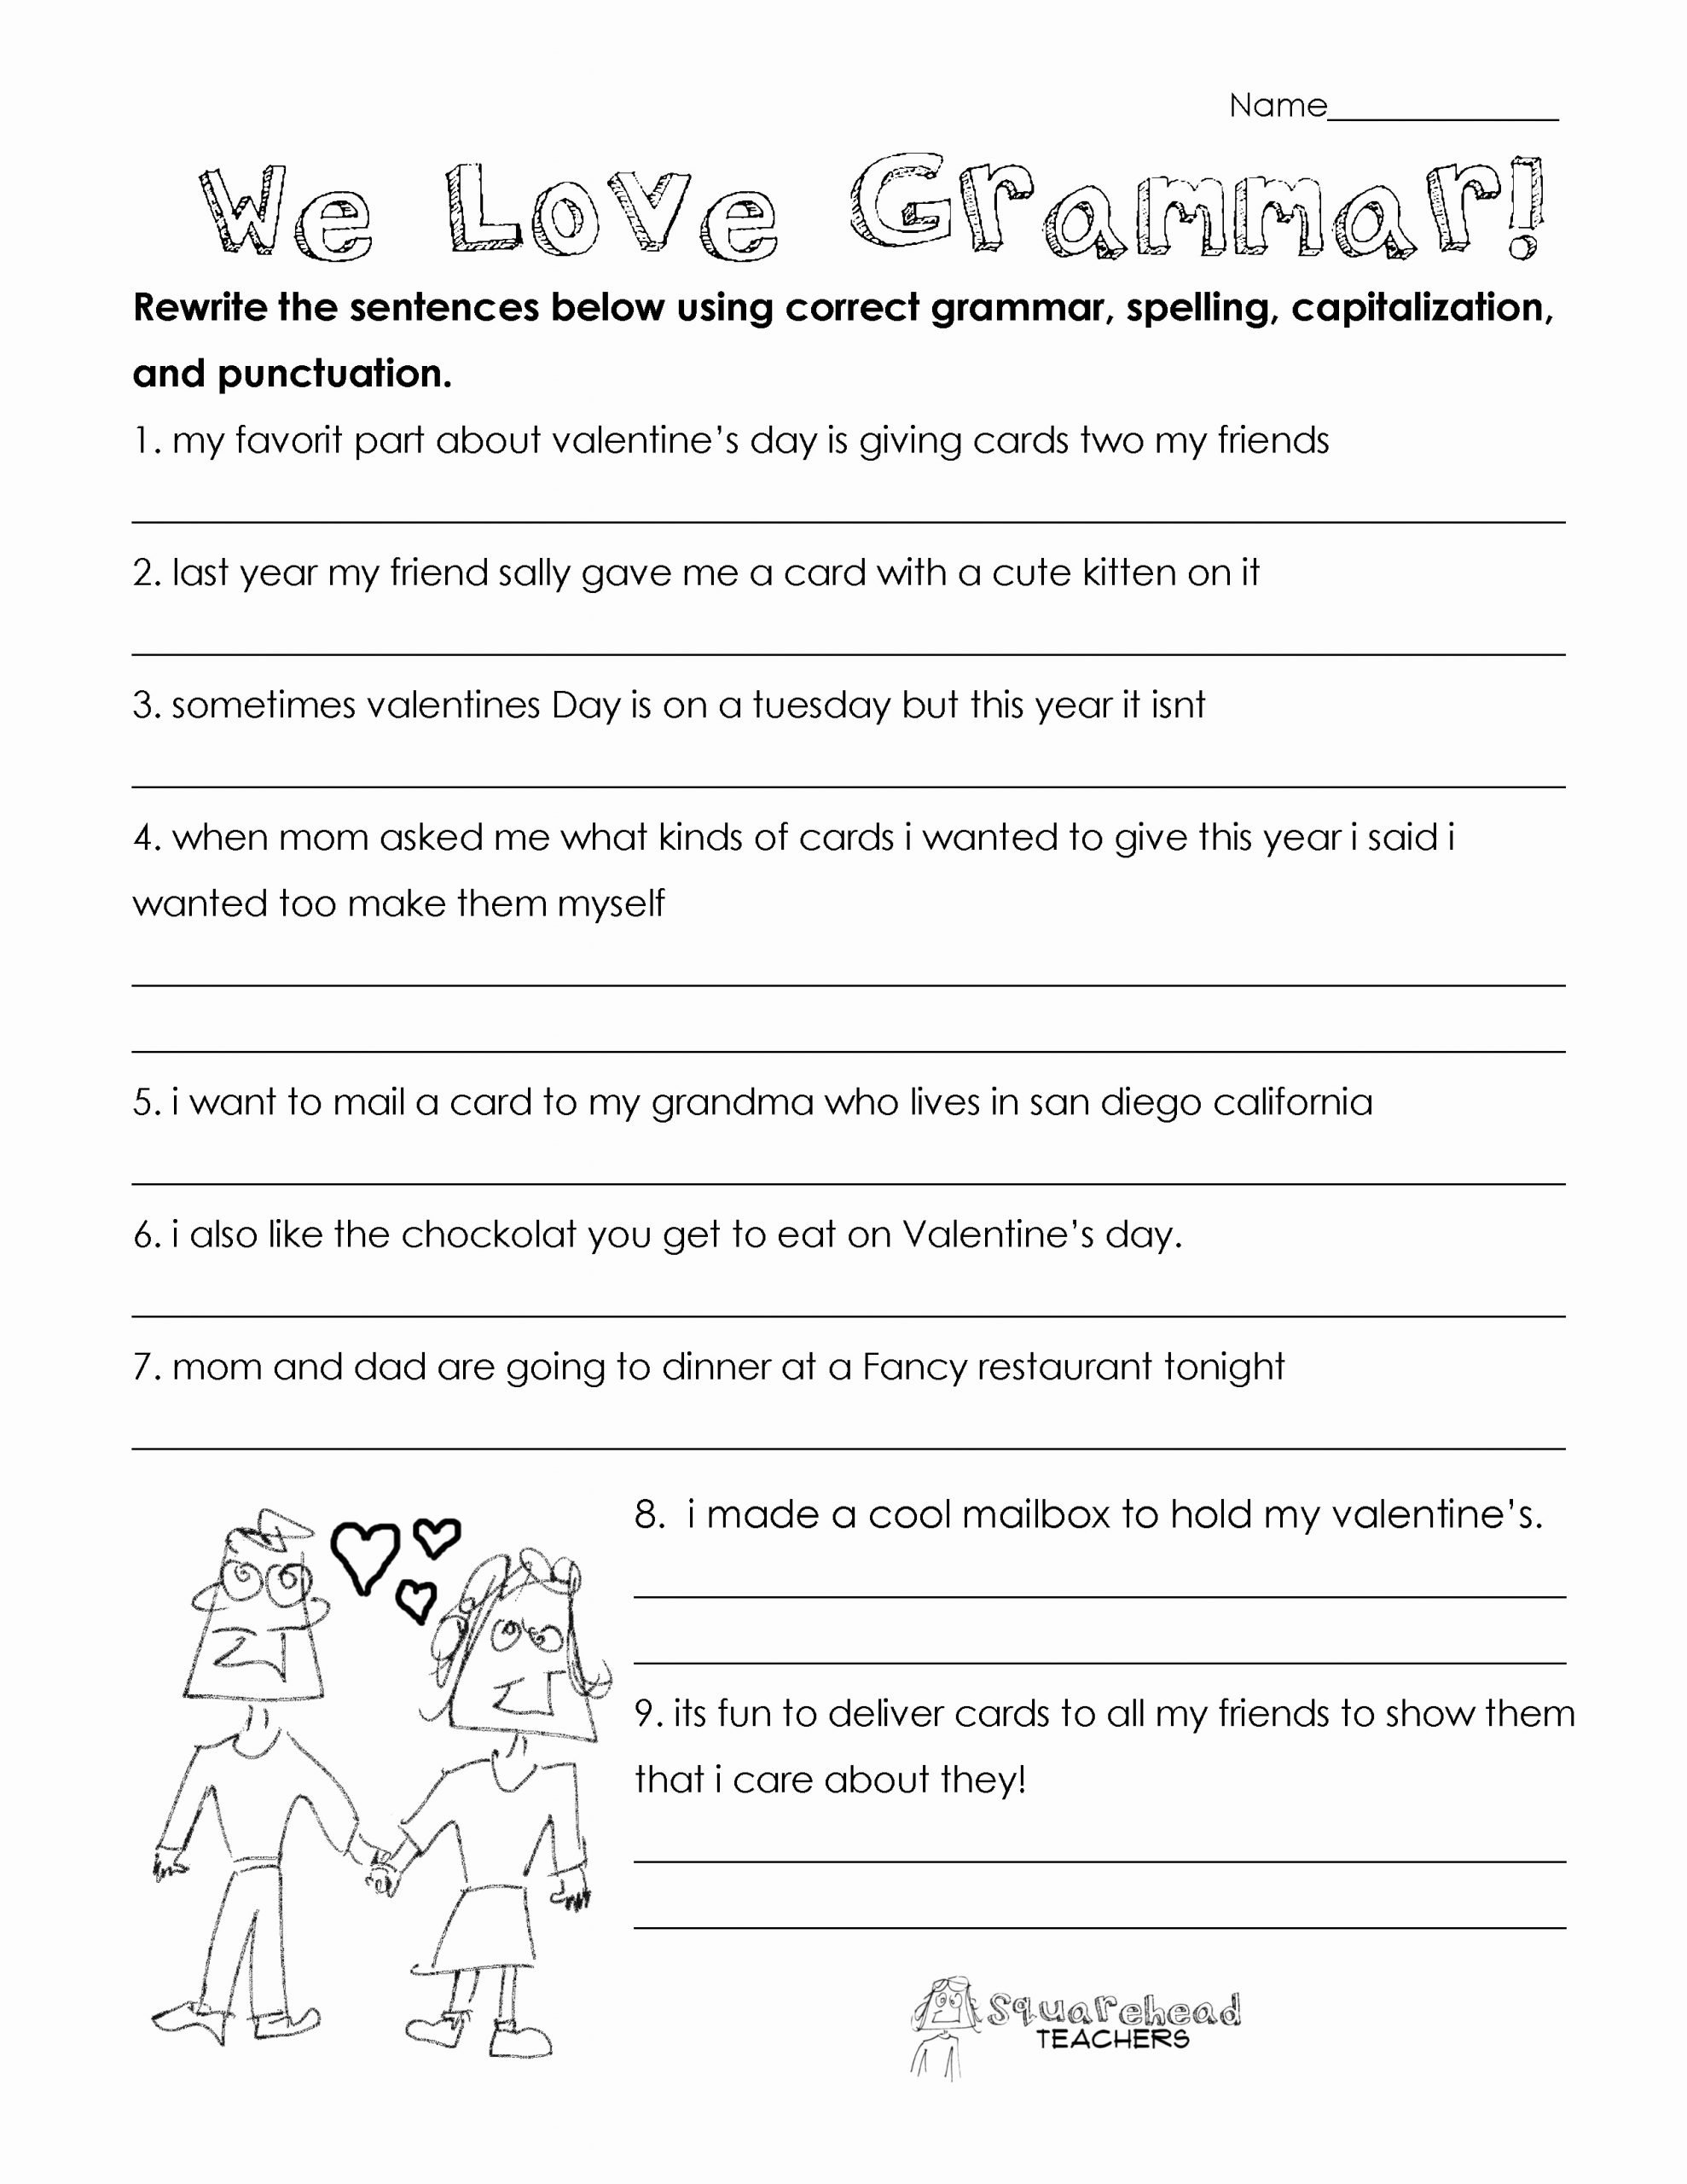 Grammar Worksheets for 8th Graders Best Of Valentine S Day Grammar Free Worksheet for 3rd Grade and Up